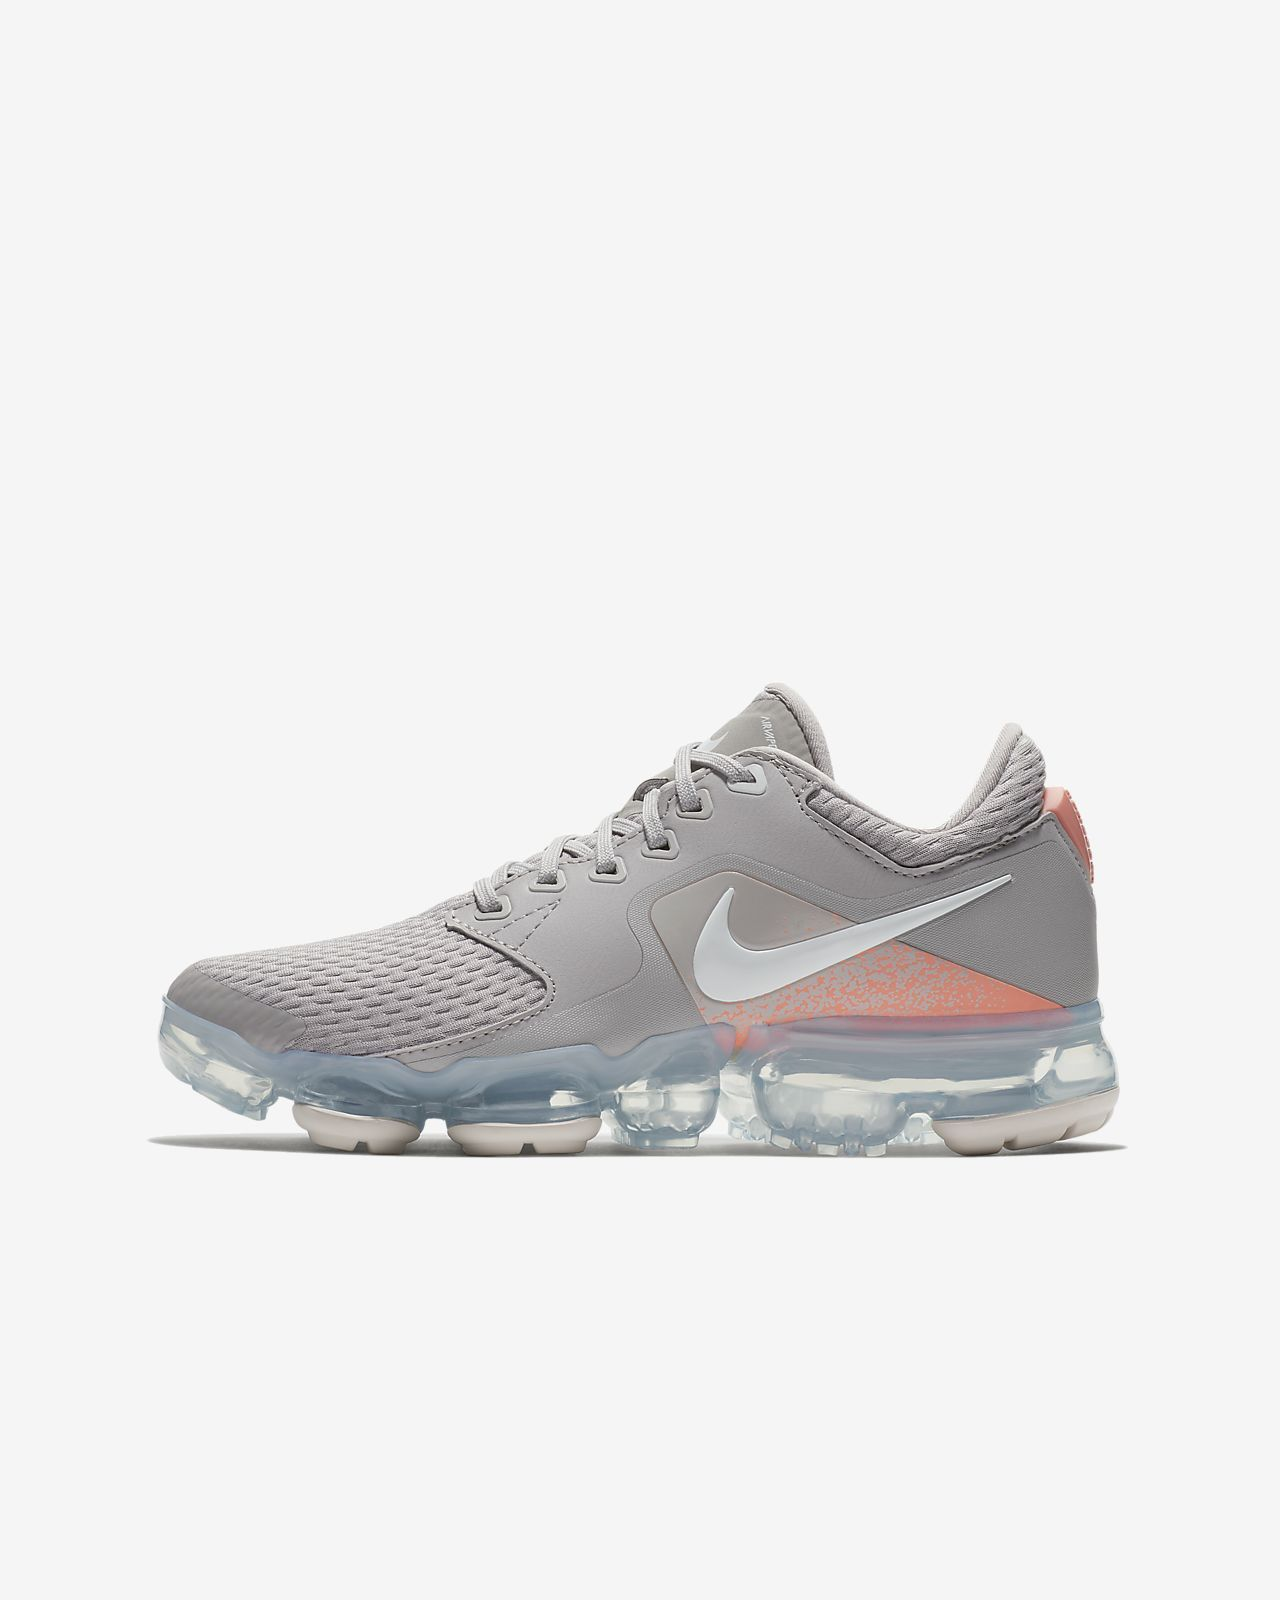 cd49bae3050 Big Kids Nike Air VaporMax Running Shoe Atmosphere Grey Vast Grey Crimson  Pulse White - 917962-008